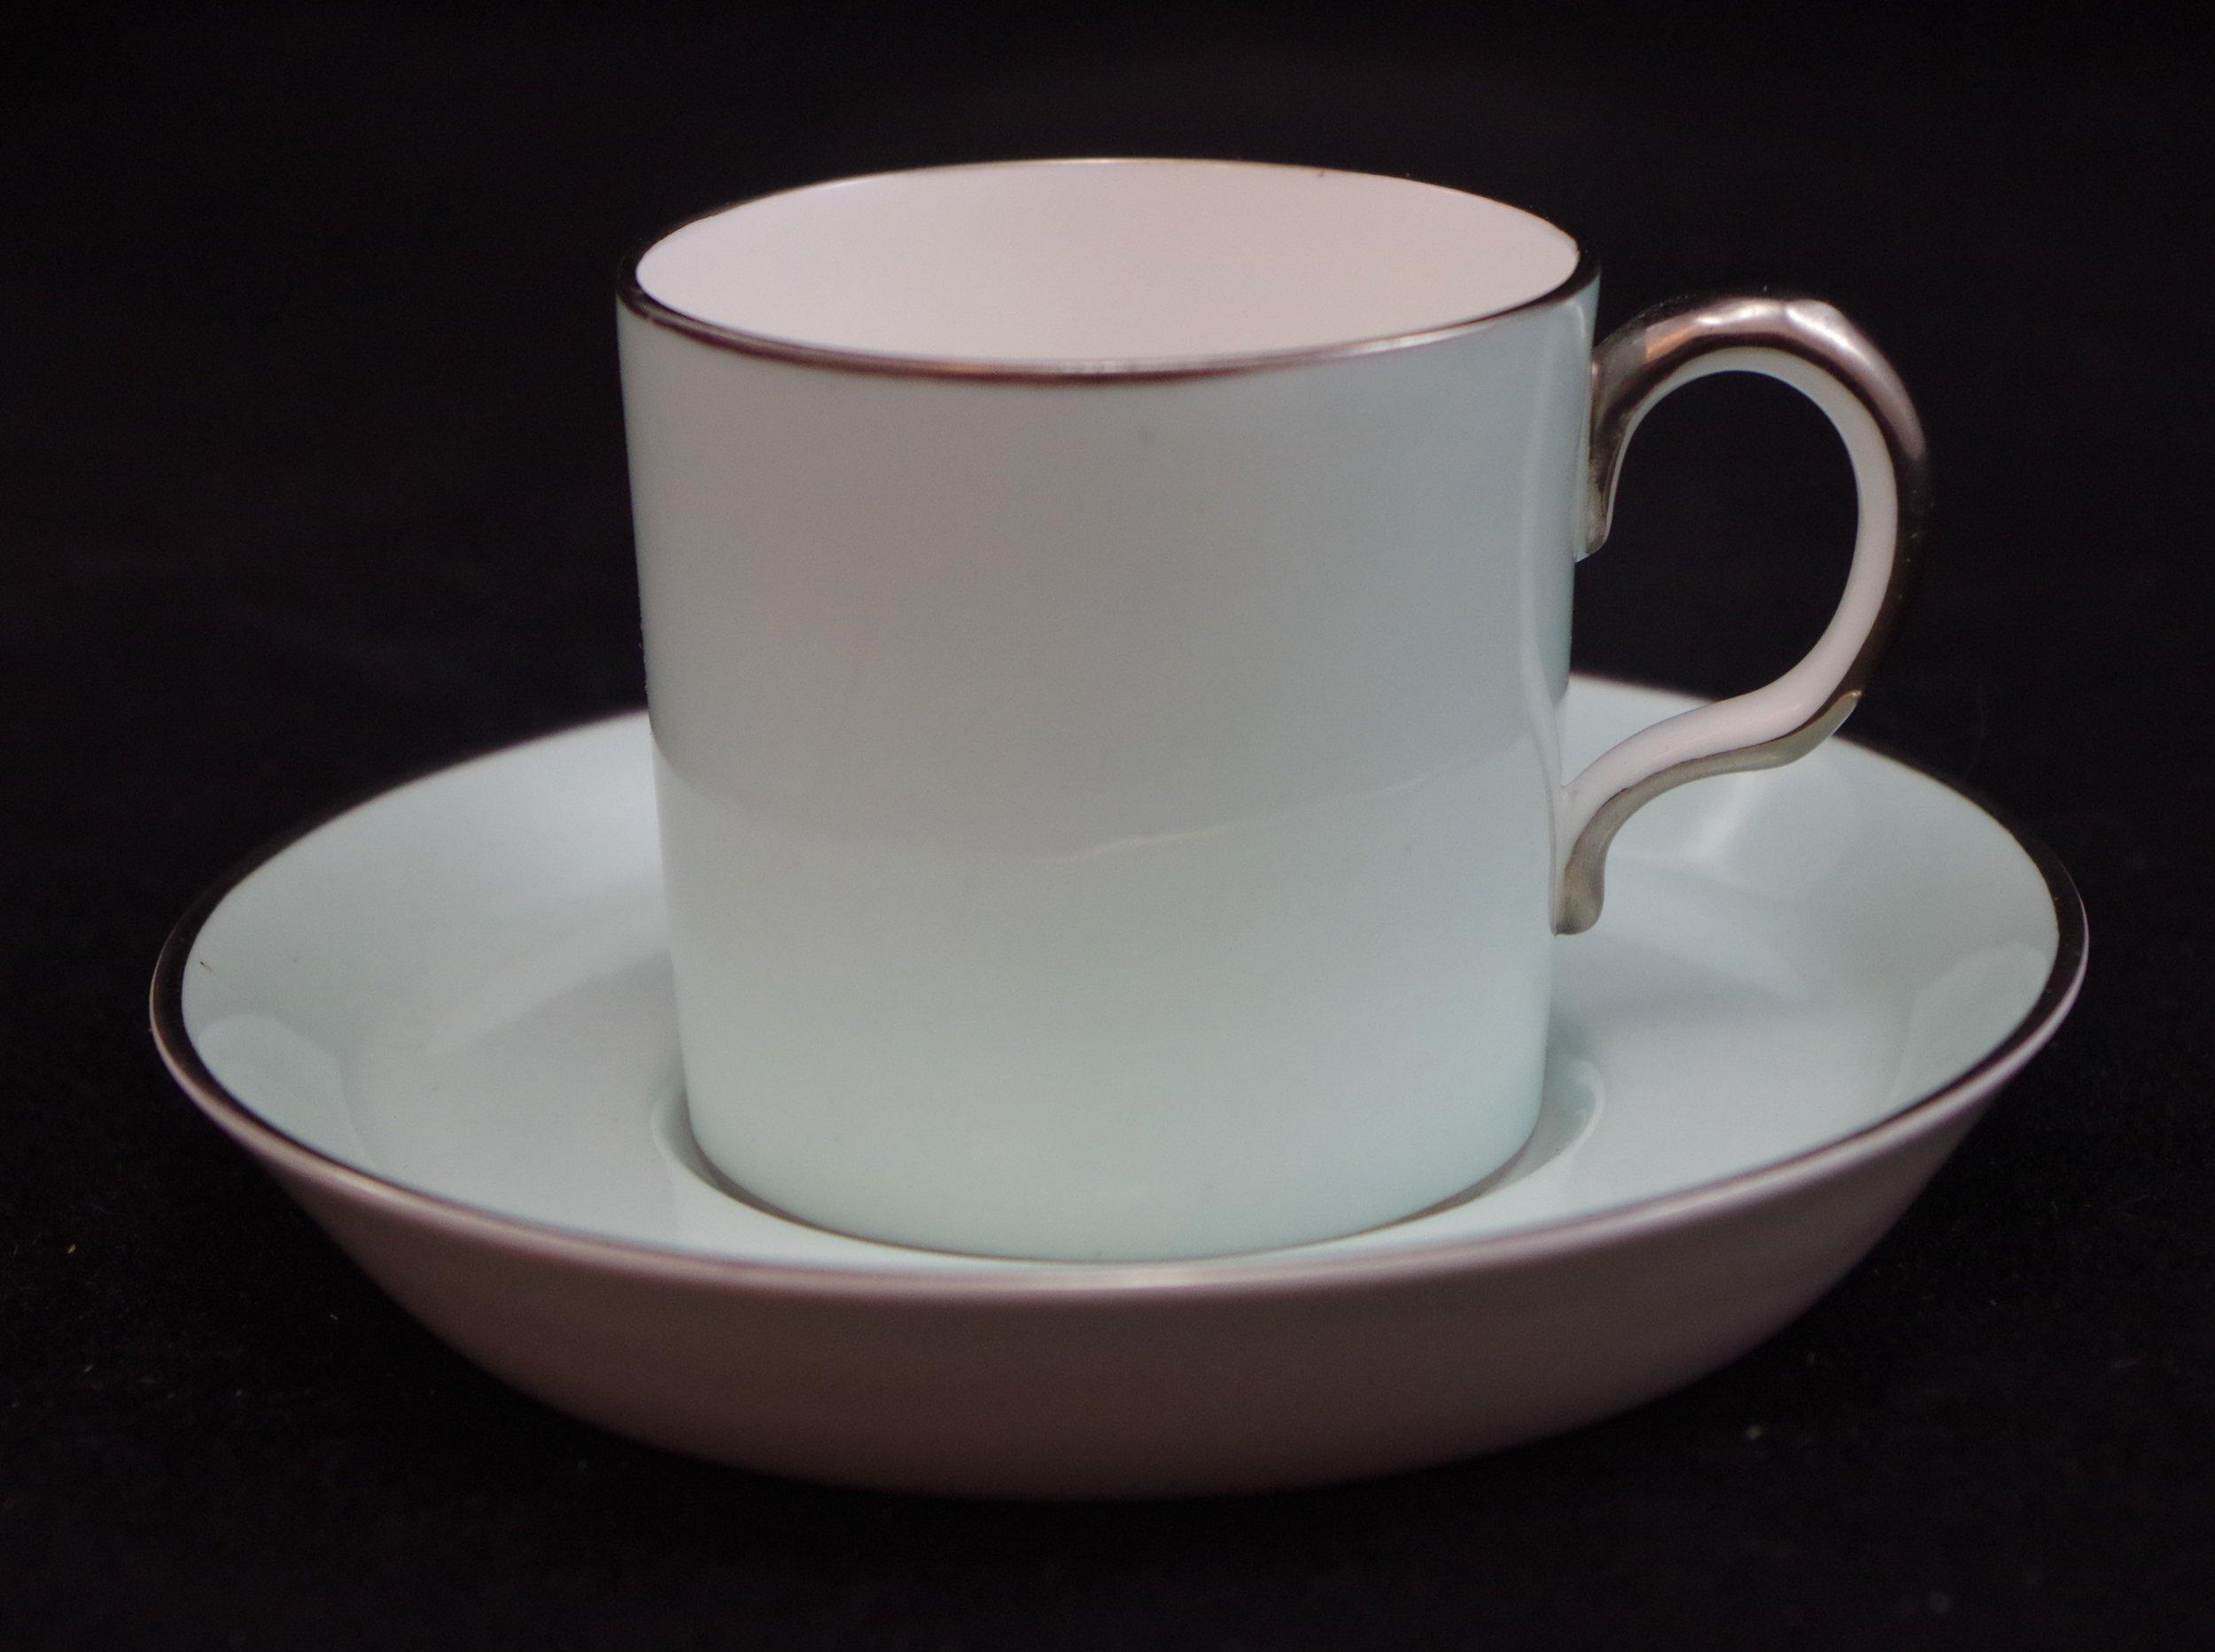 royal-crown-derby-coffee-cup-and-saucer-edinburgh-shape-celadon-ground-silver-gilt-A67